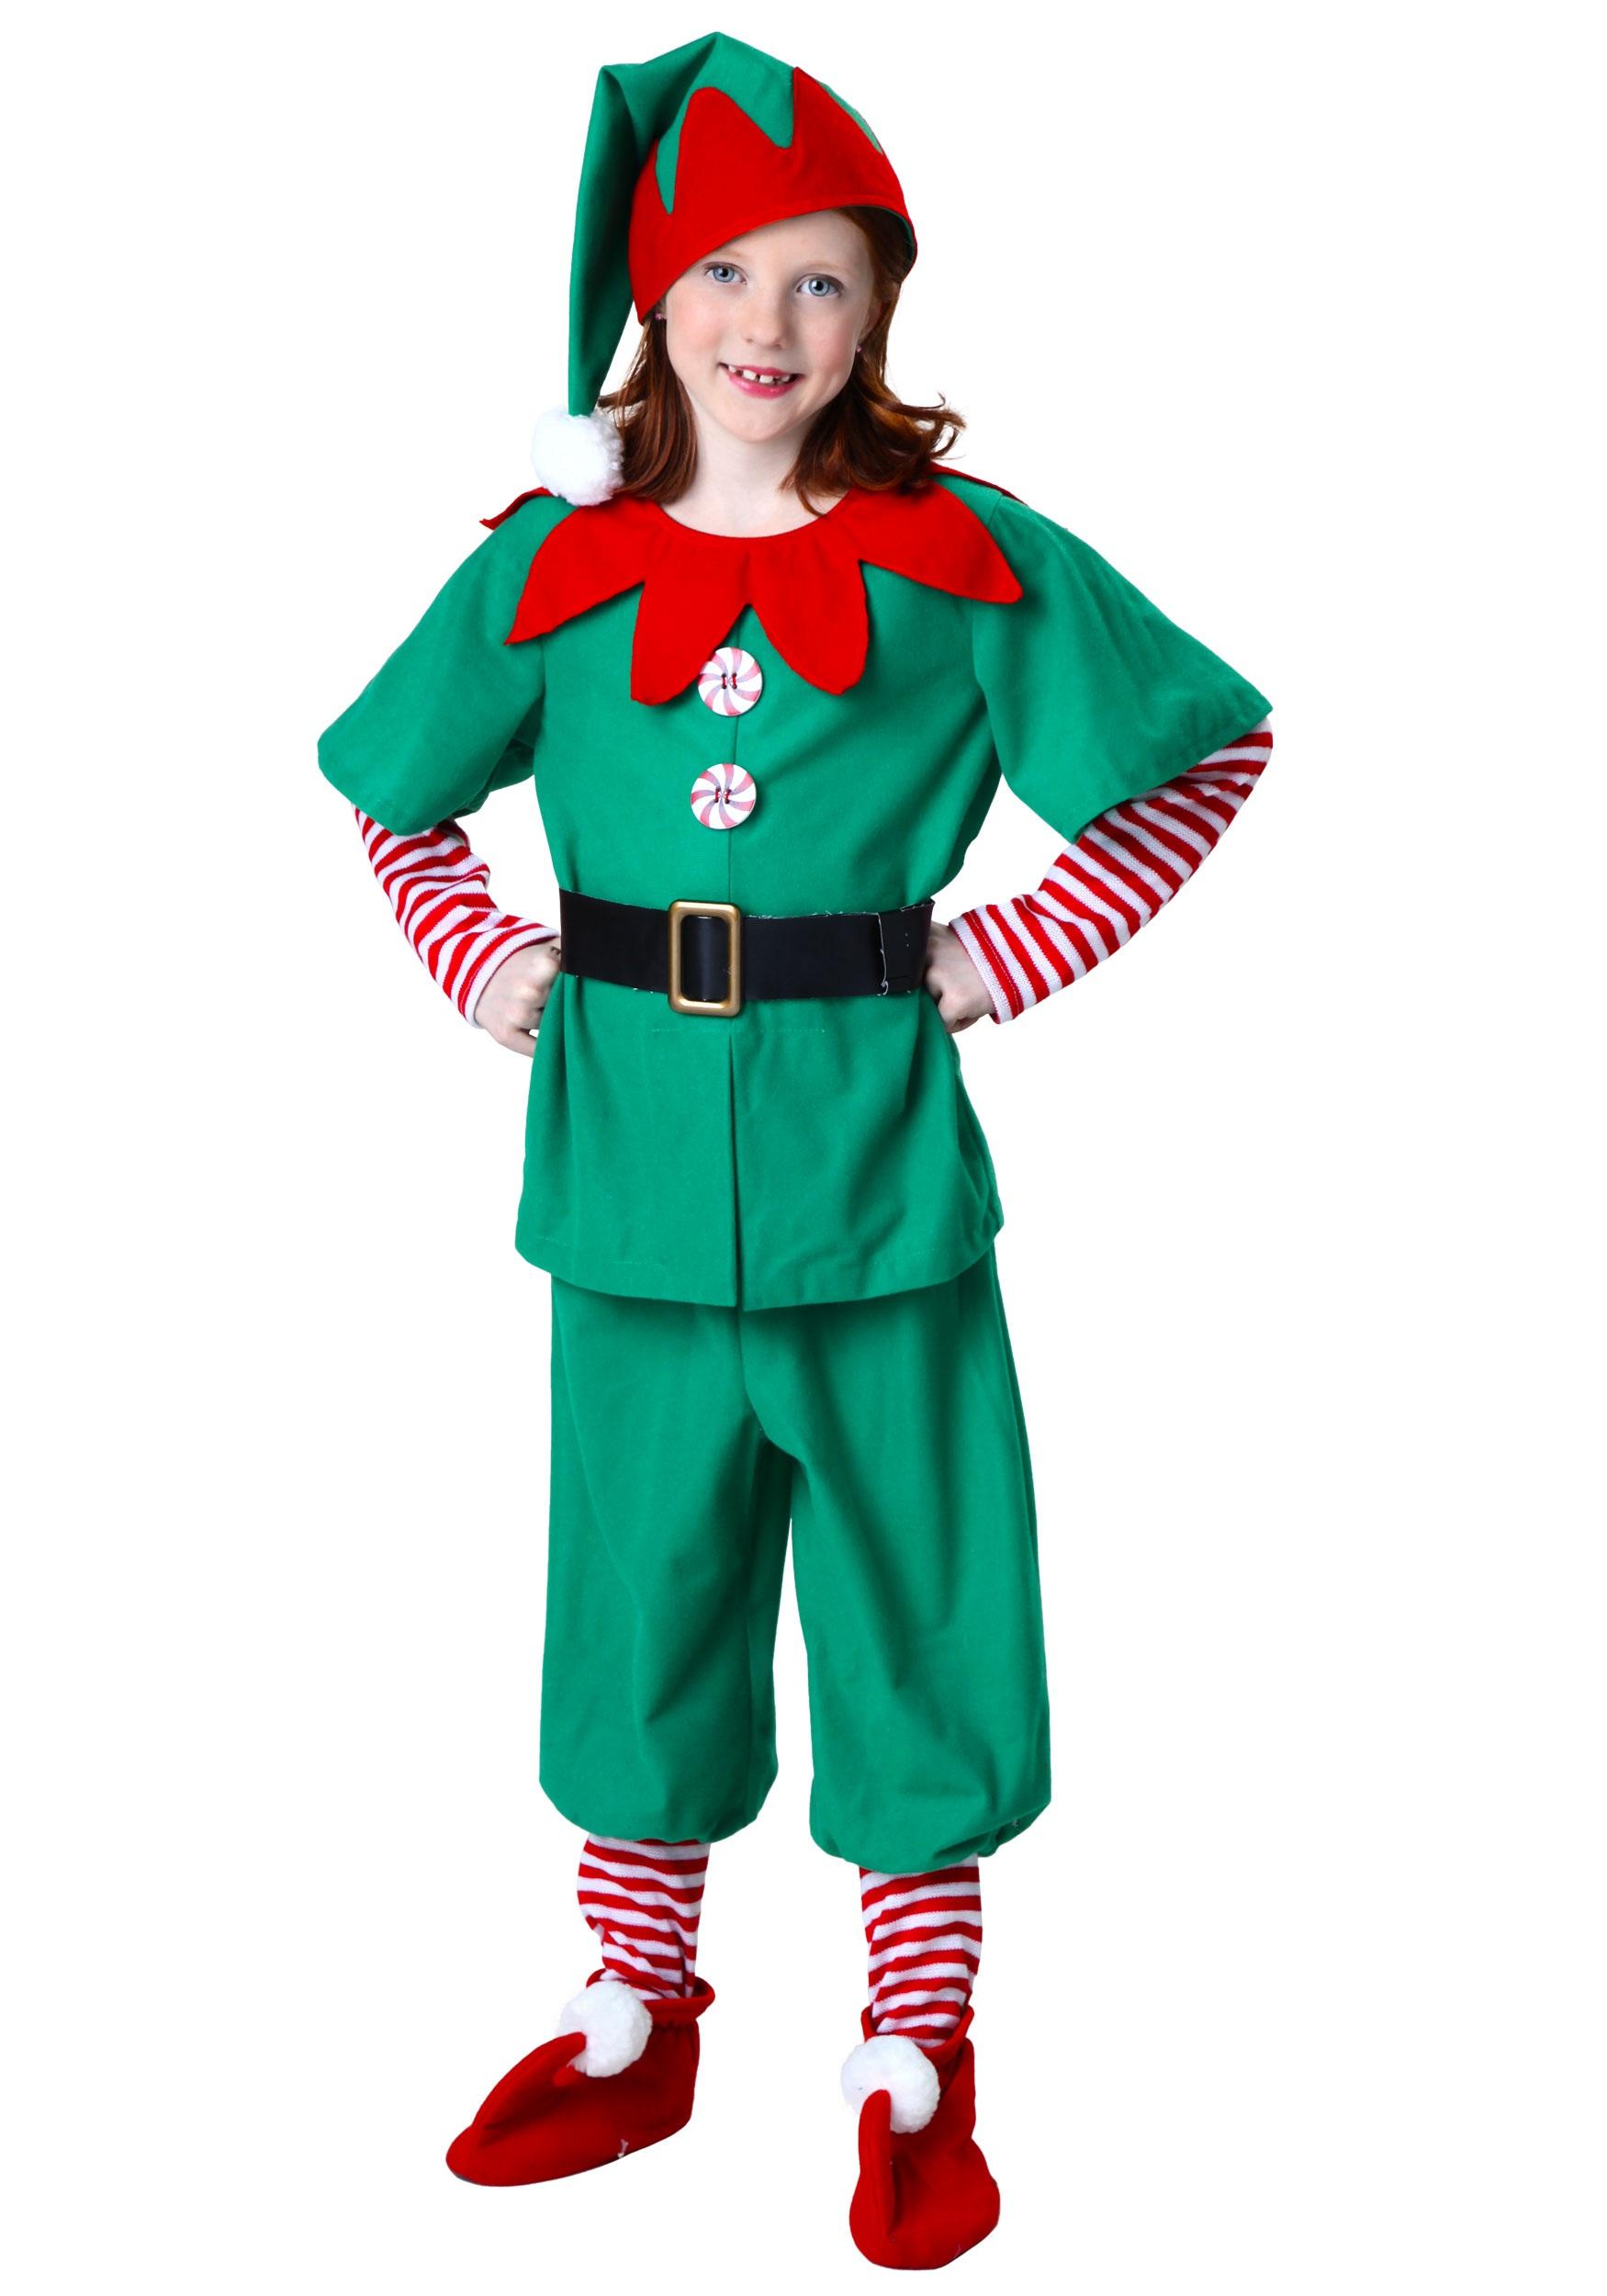 ecf06e3ea2 Child Holiday Elf Costume Child Holiday Elf Costume 2 ...